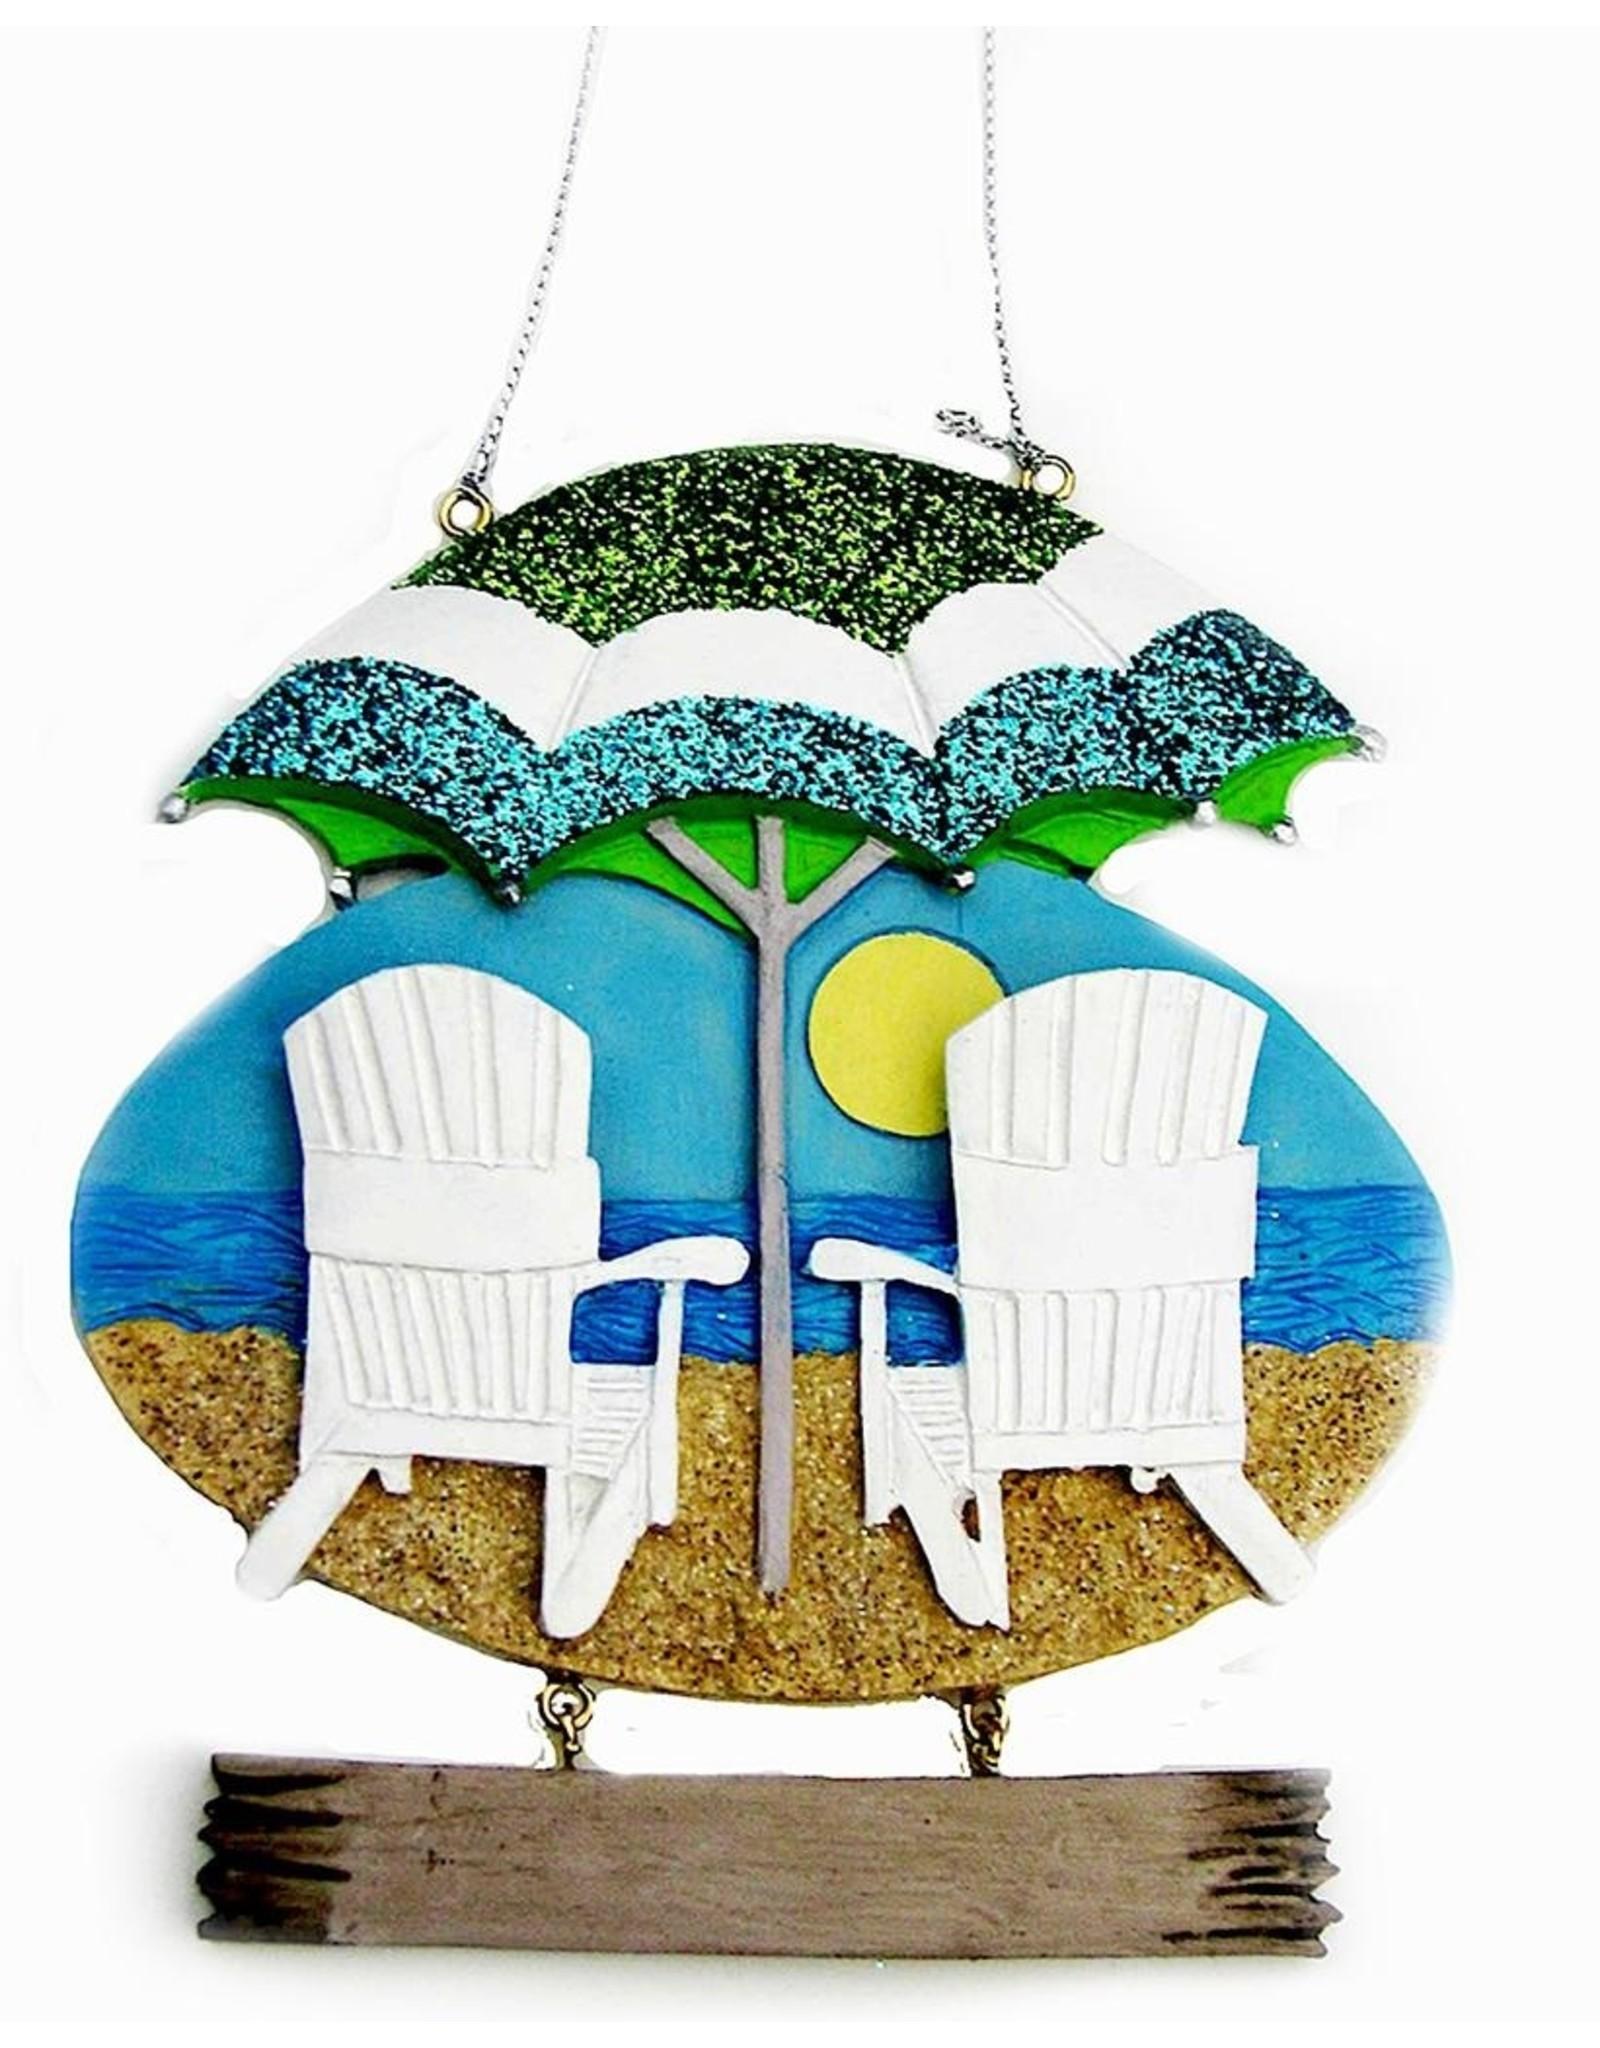 Kurt Adler Beach Chair Christmas Ornament For Personalization